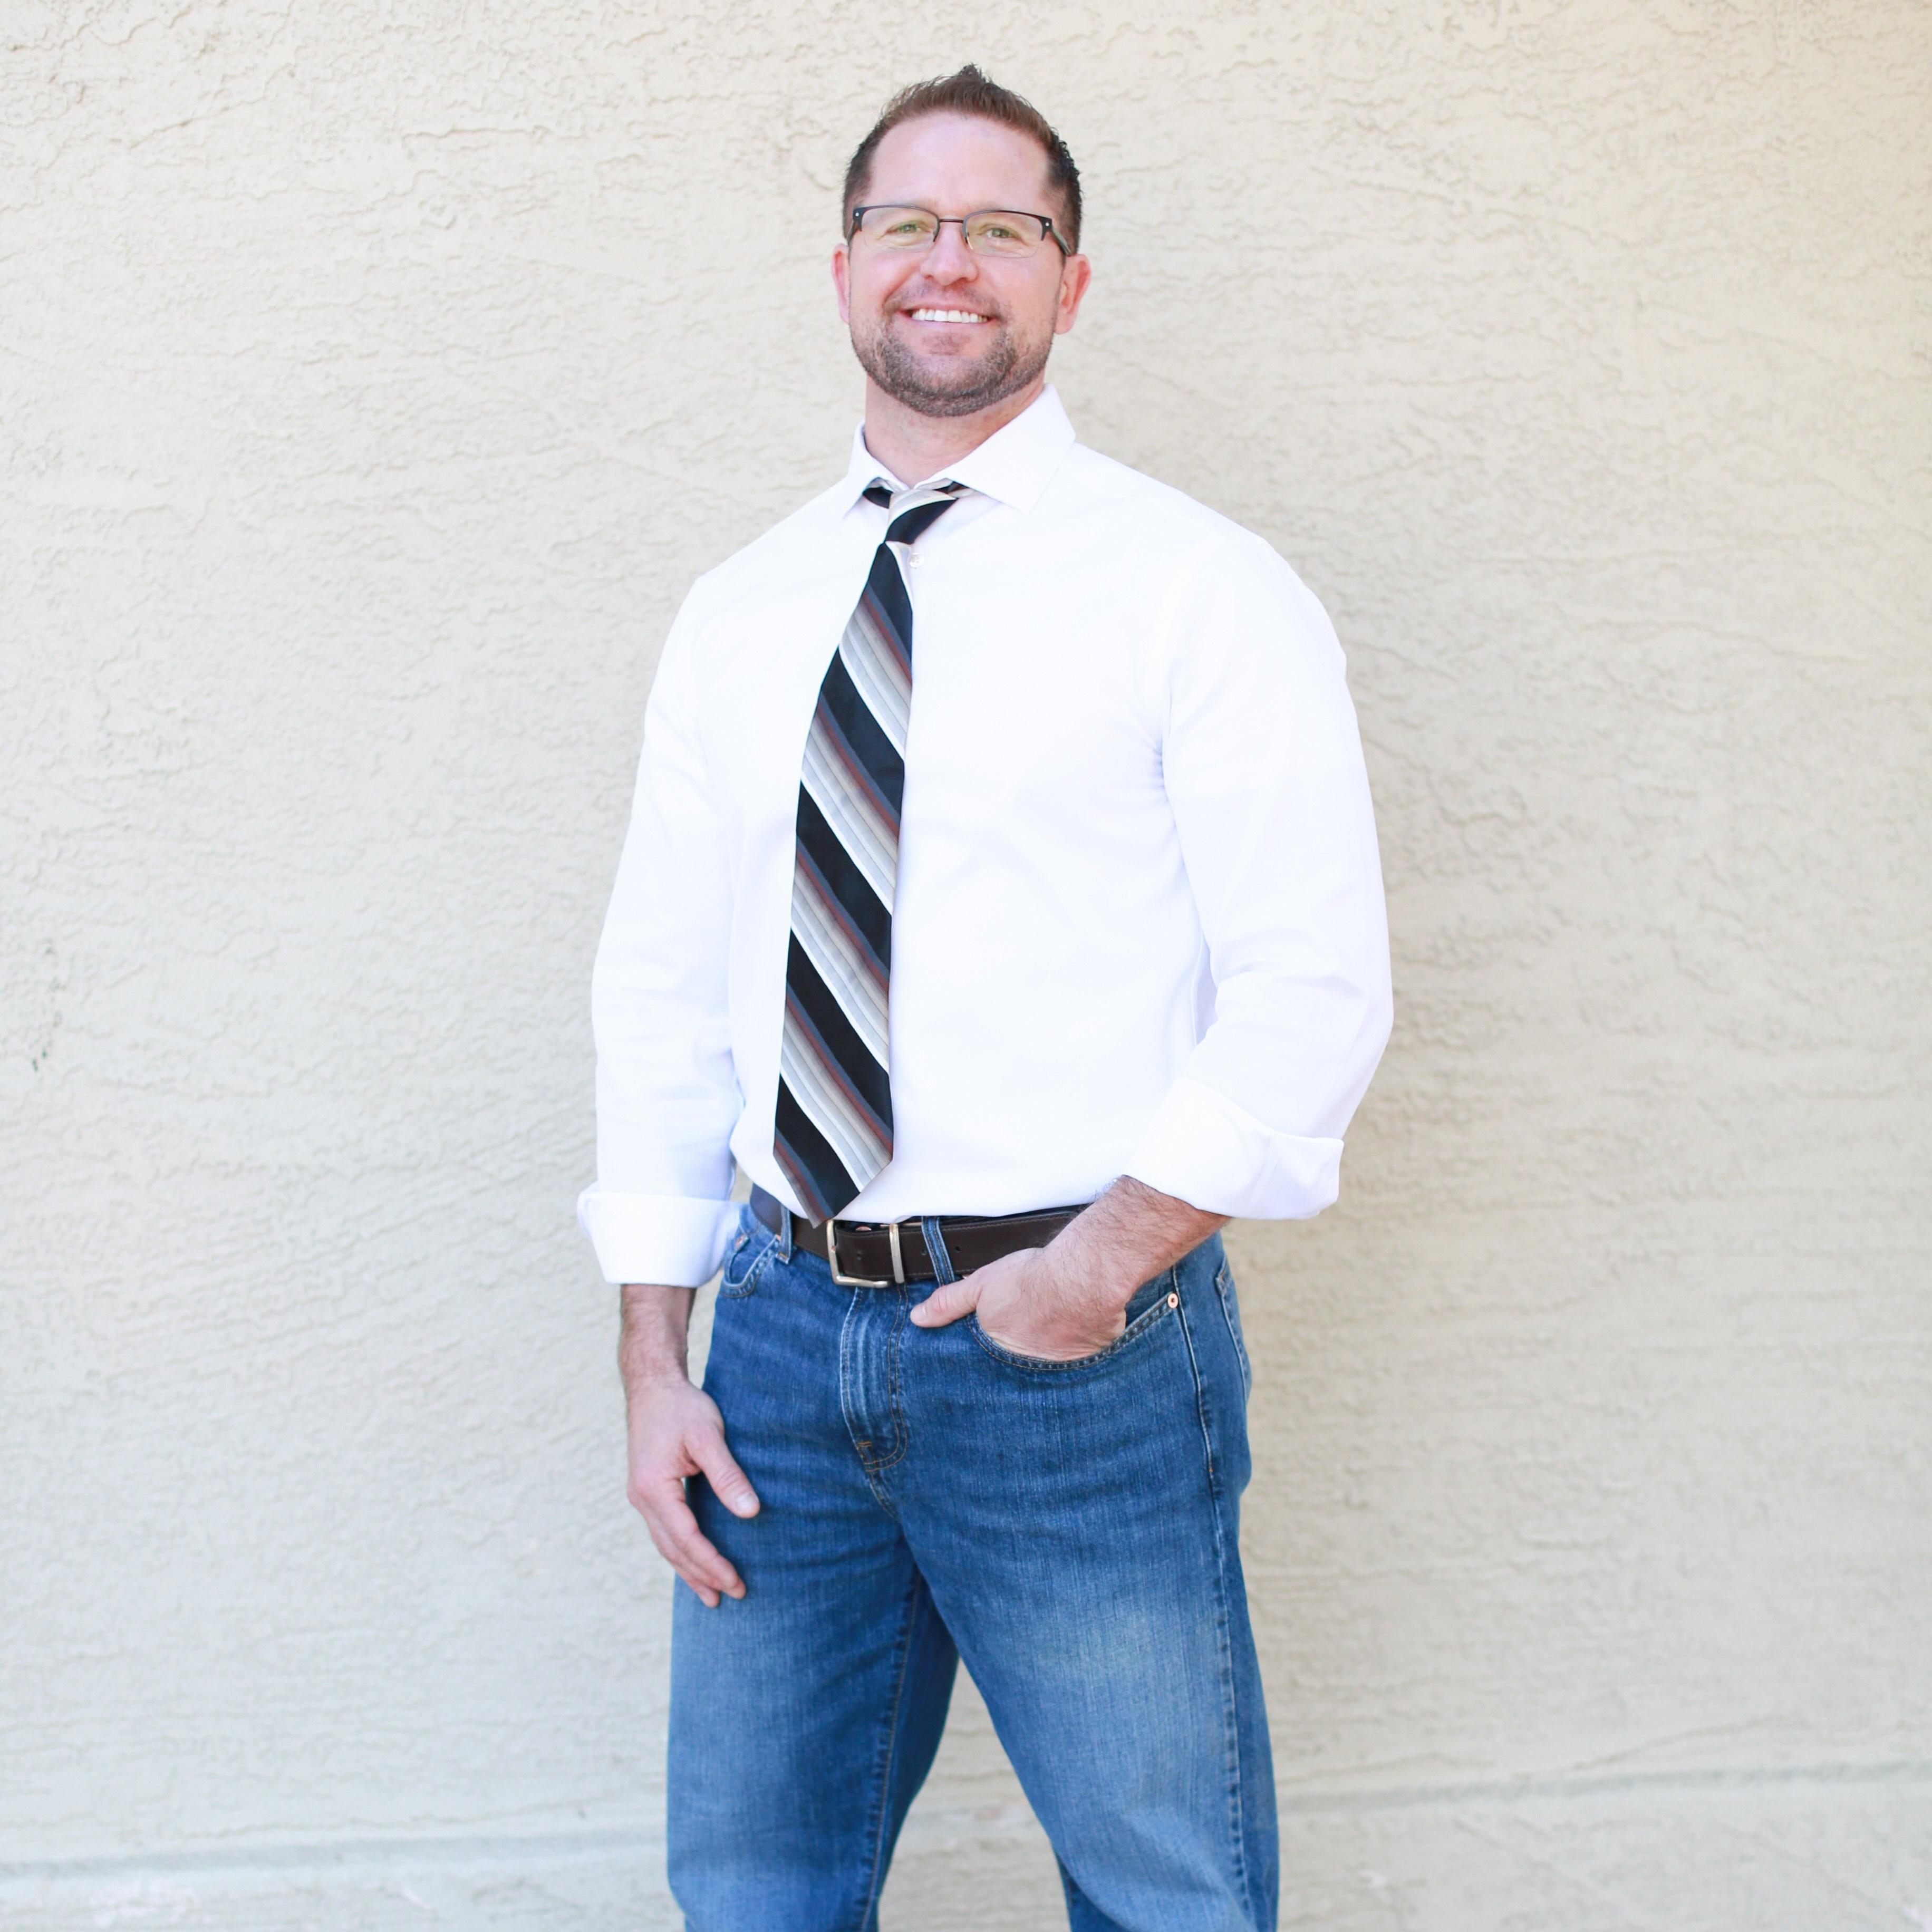 Chad Conley